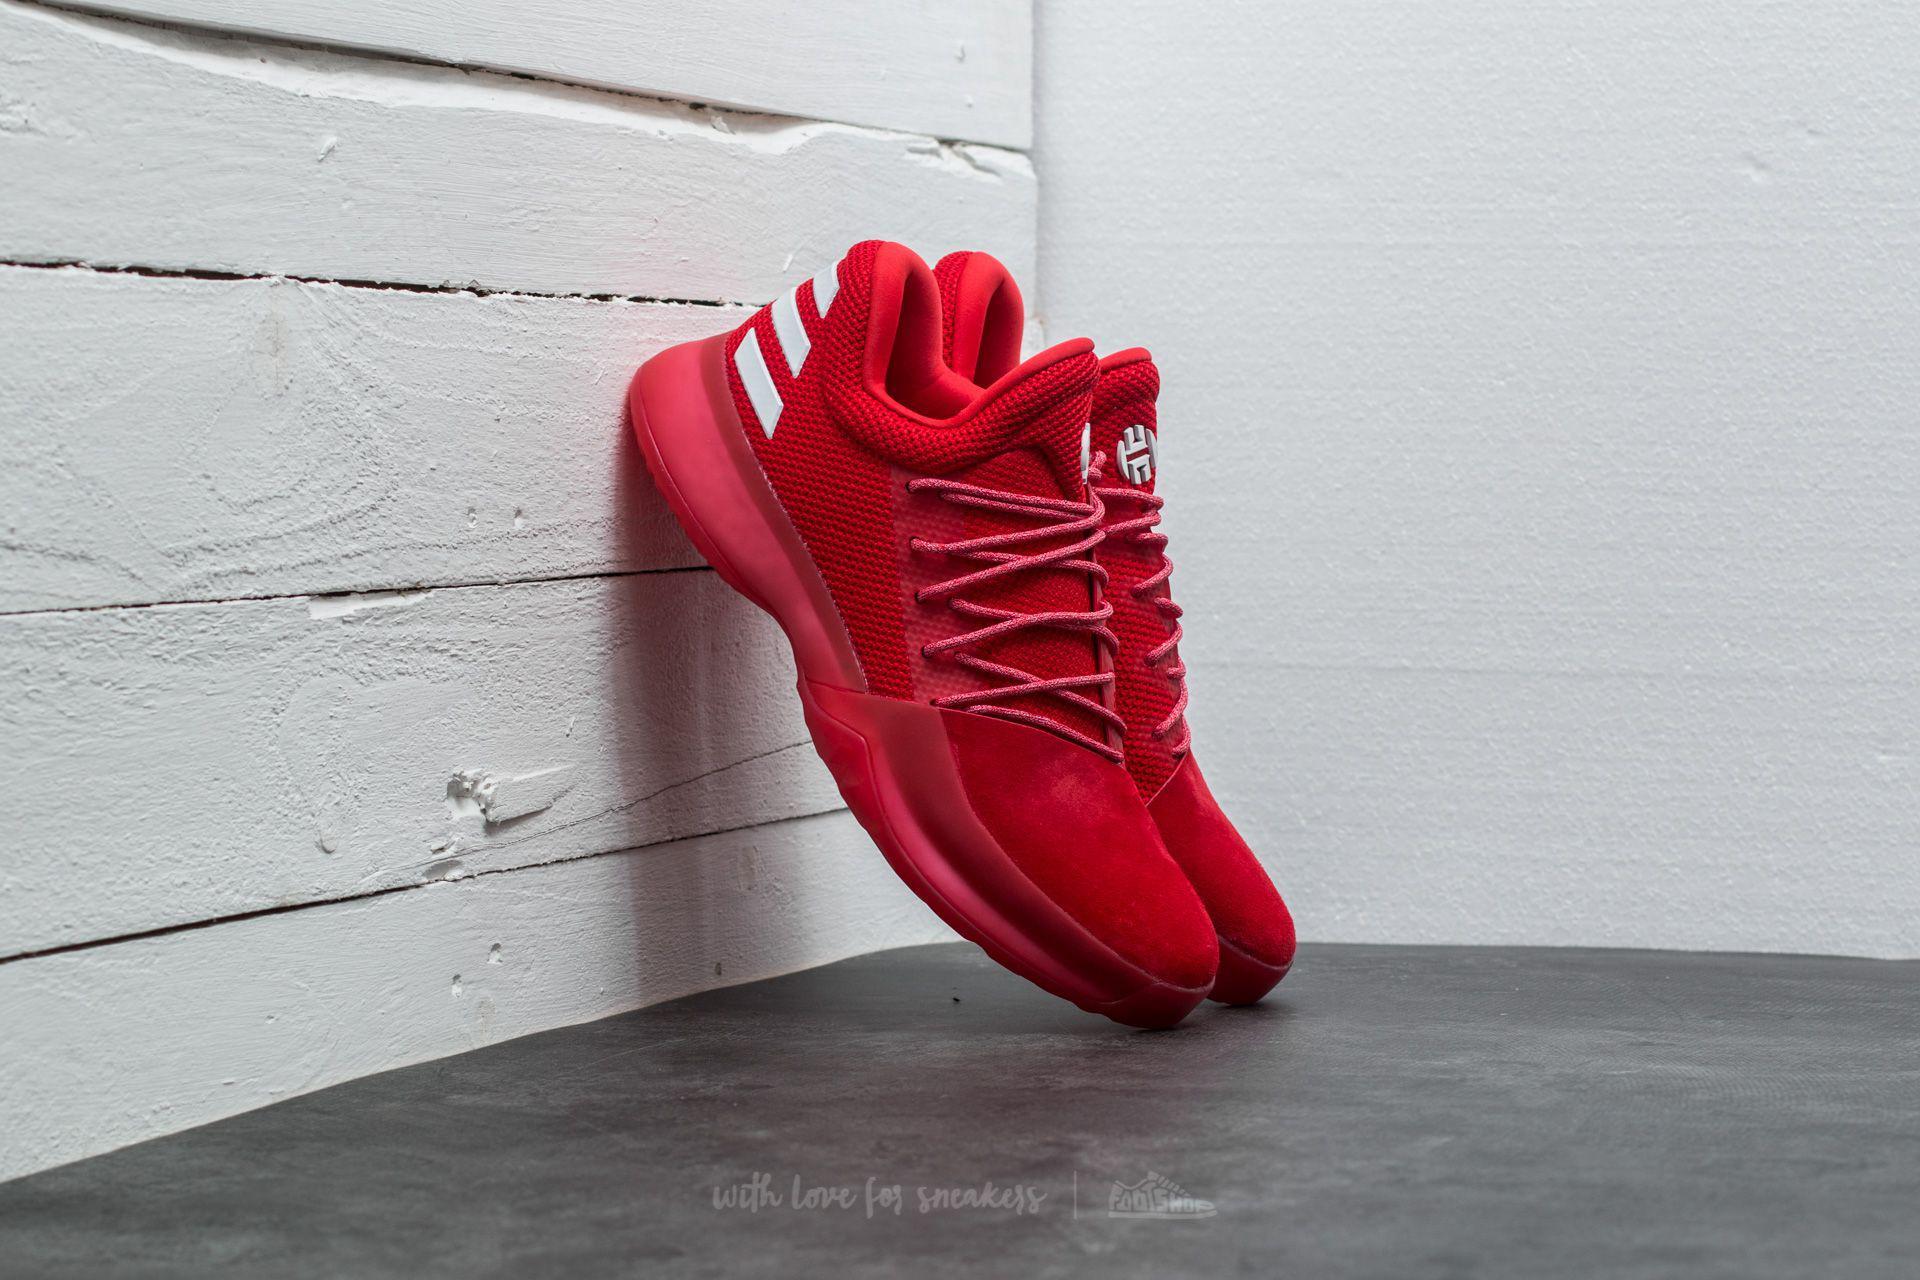 702b1f36bbe ... coupon code for lyst adidas originals adidas harden vol. 1 scarlet  light scarlet 1bdaa 5036a